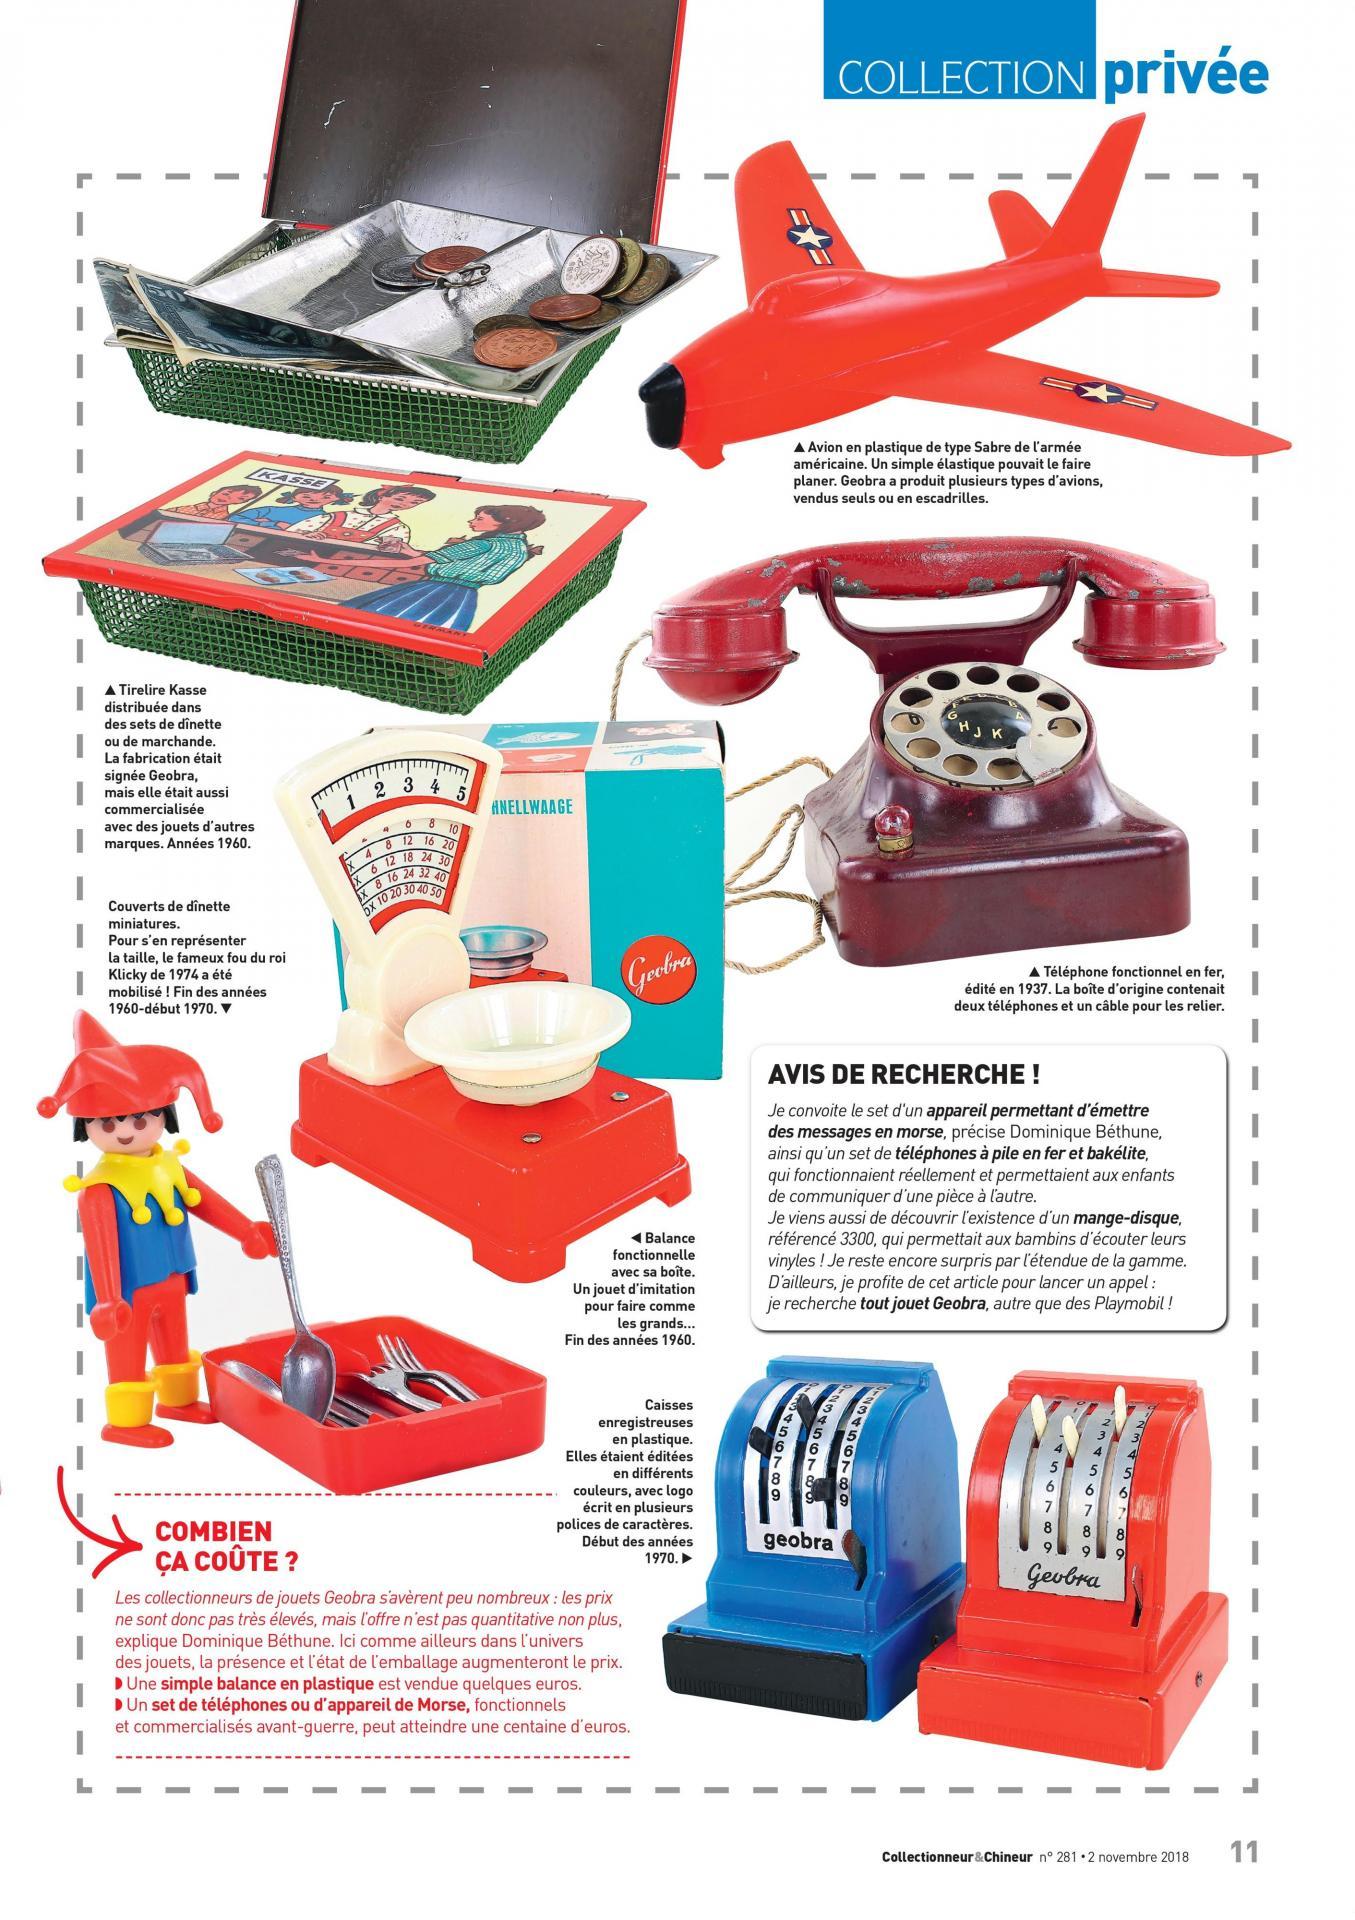 Playmobil Jouet Bon Playmobil Plan Jouet Jouet Playmobil Bon Plan Plan Bon exWCBodr